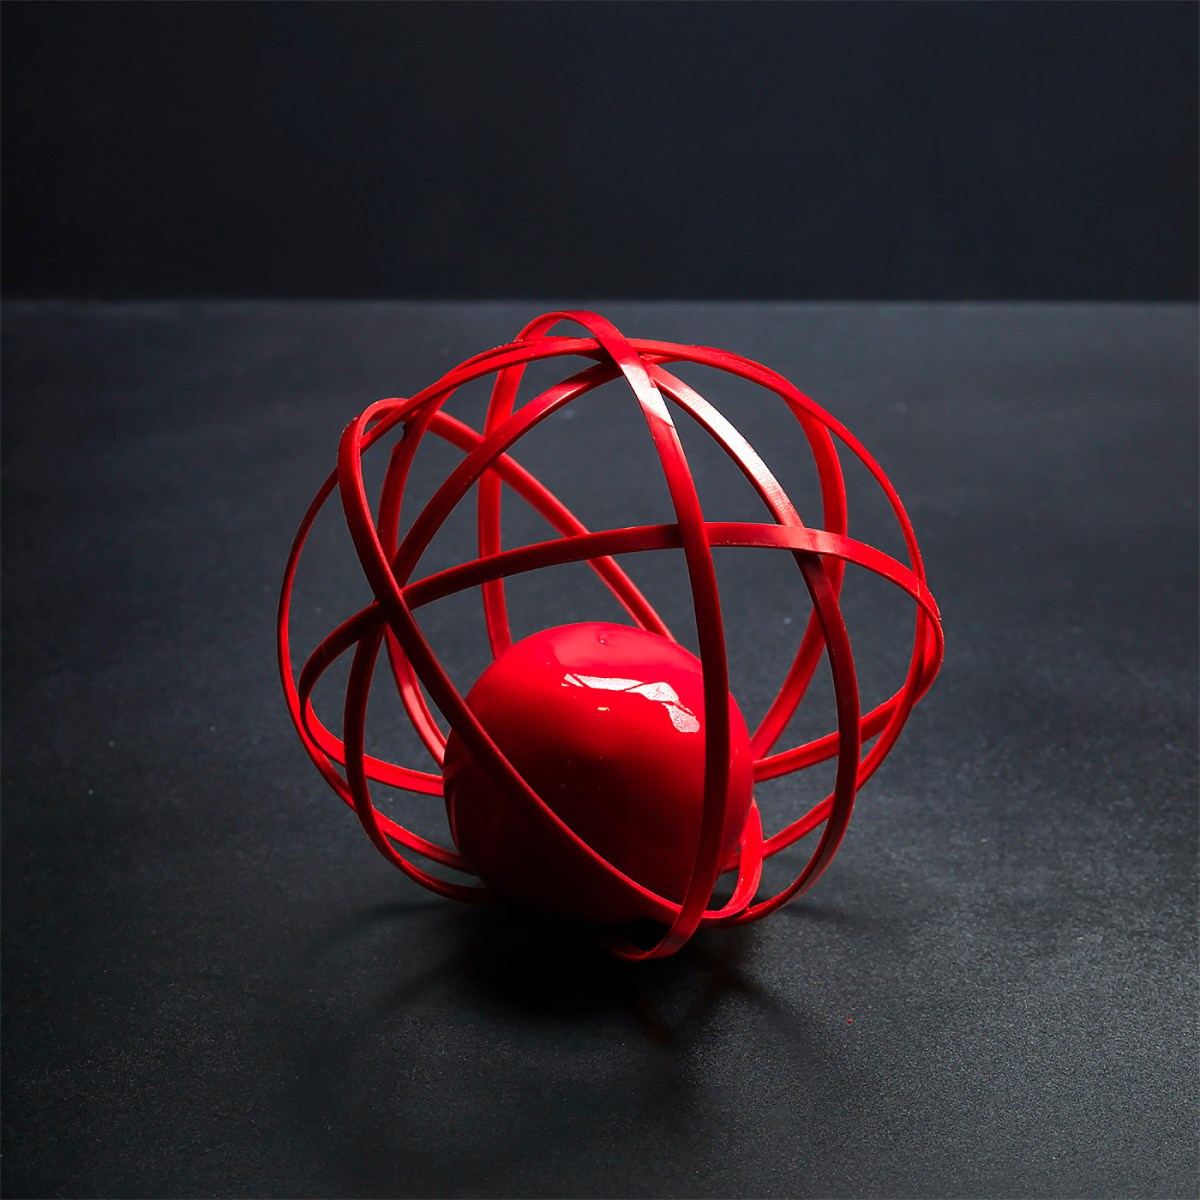 art-dinara-kasko-new-11